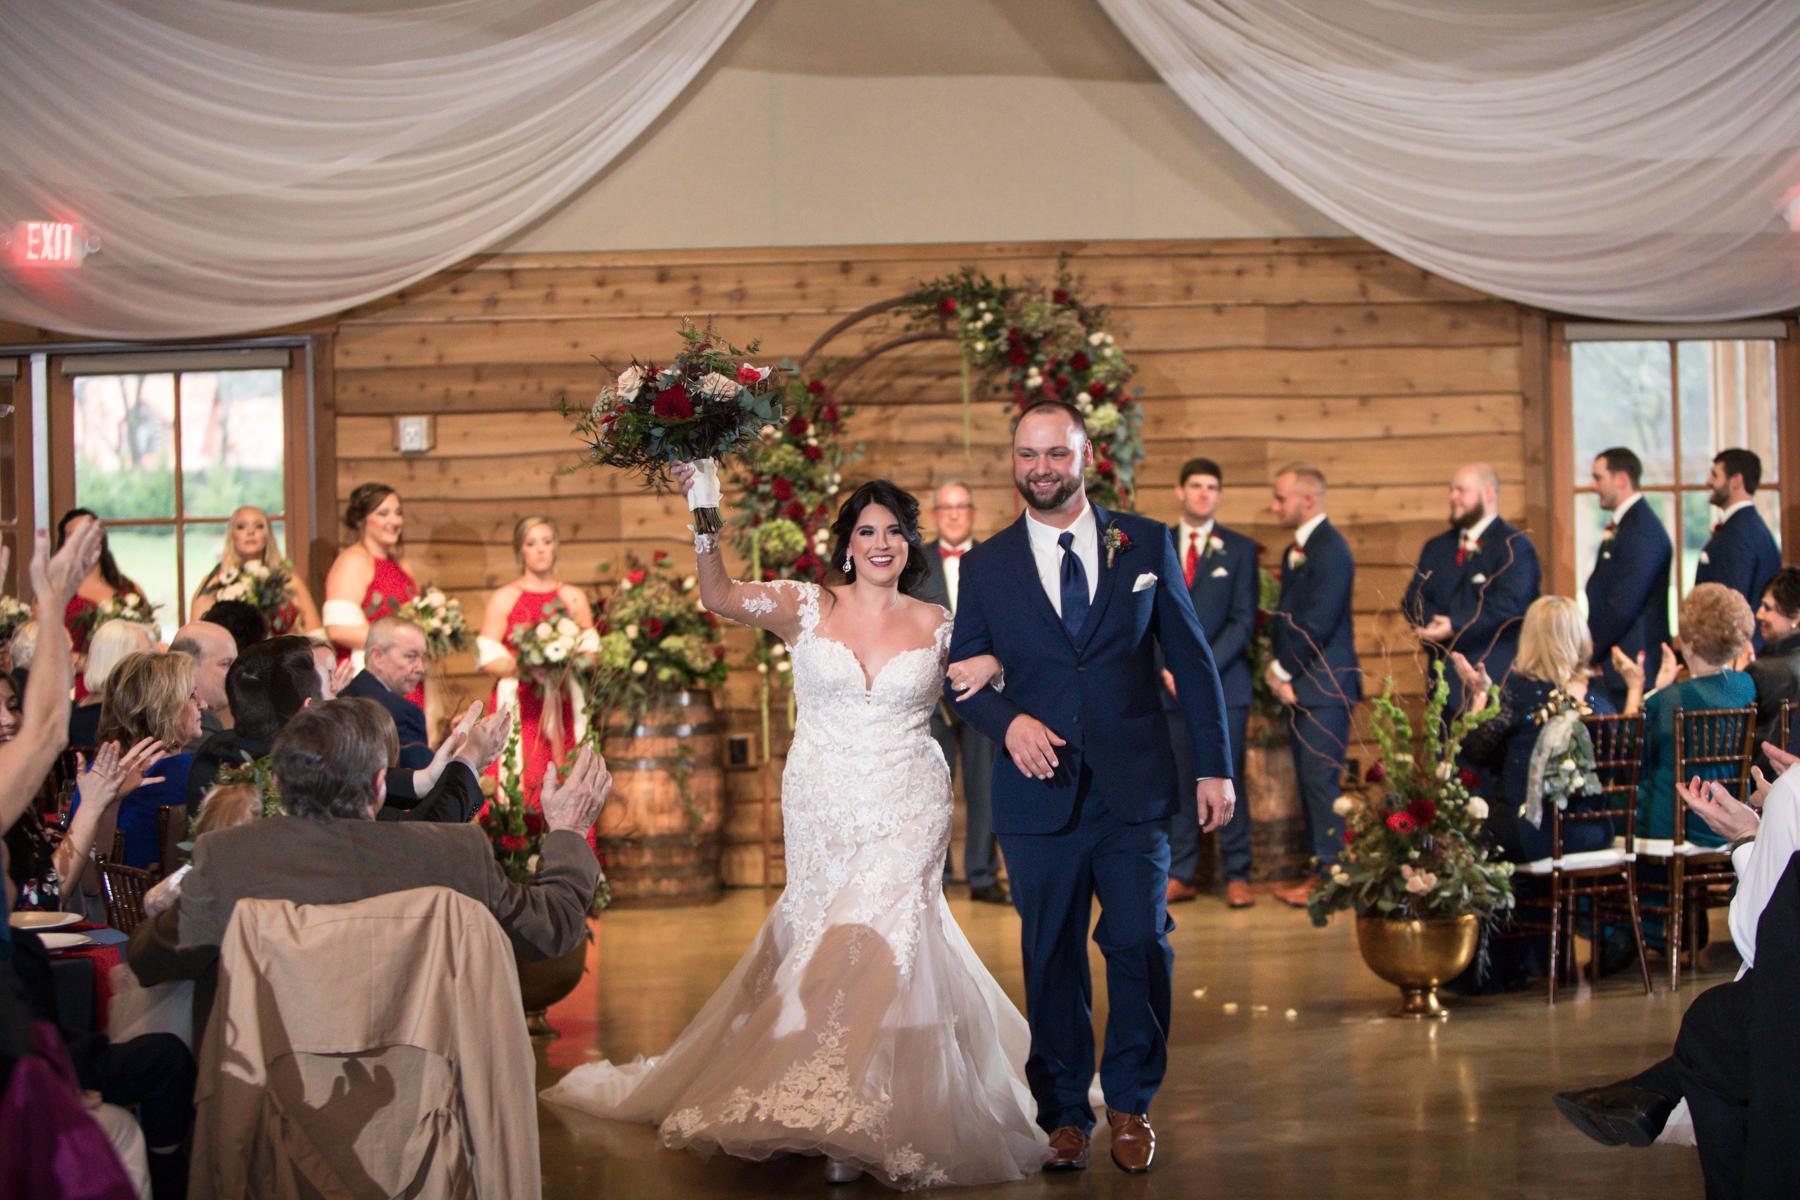 The-barn-at-sycamore-farms-wedding-1340.jpg